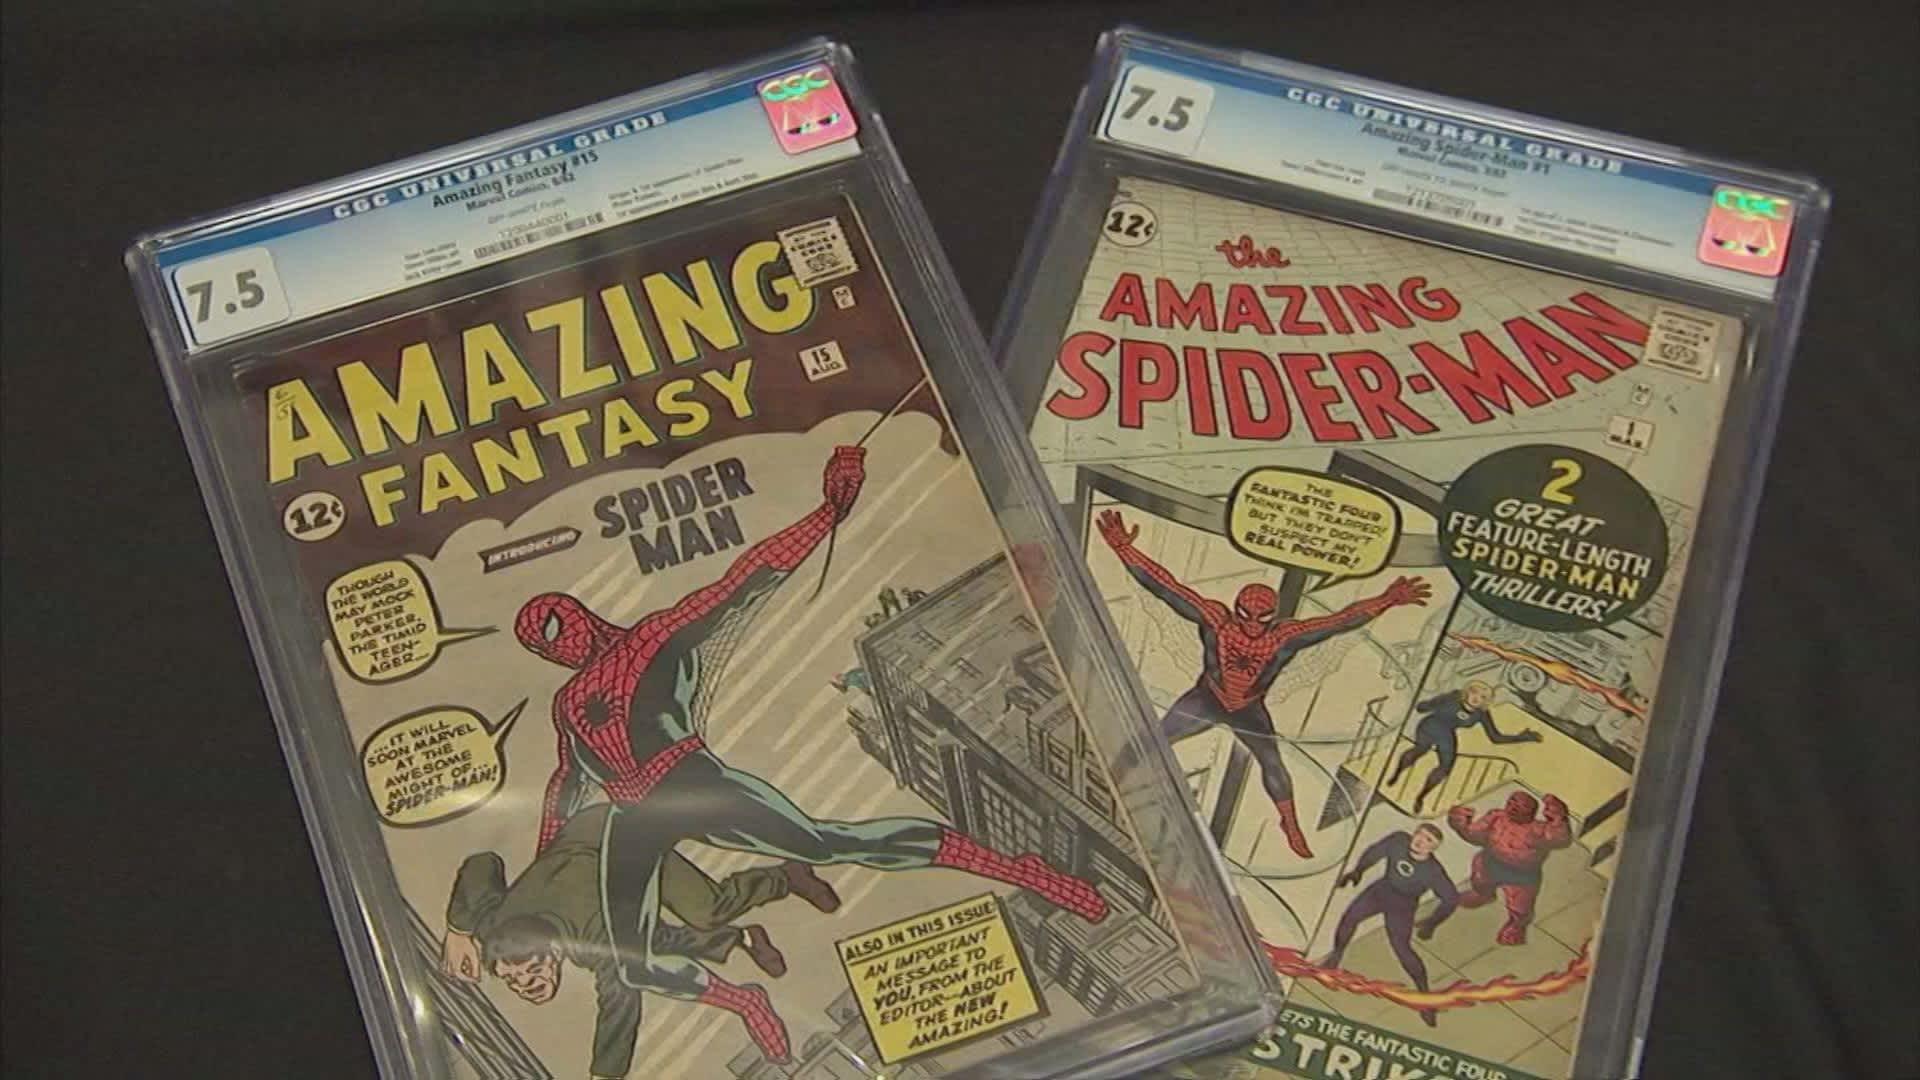 Comic Books Buck Trend As Print And Digital Sales Flourish